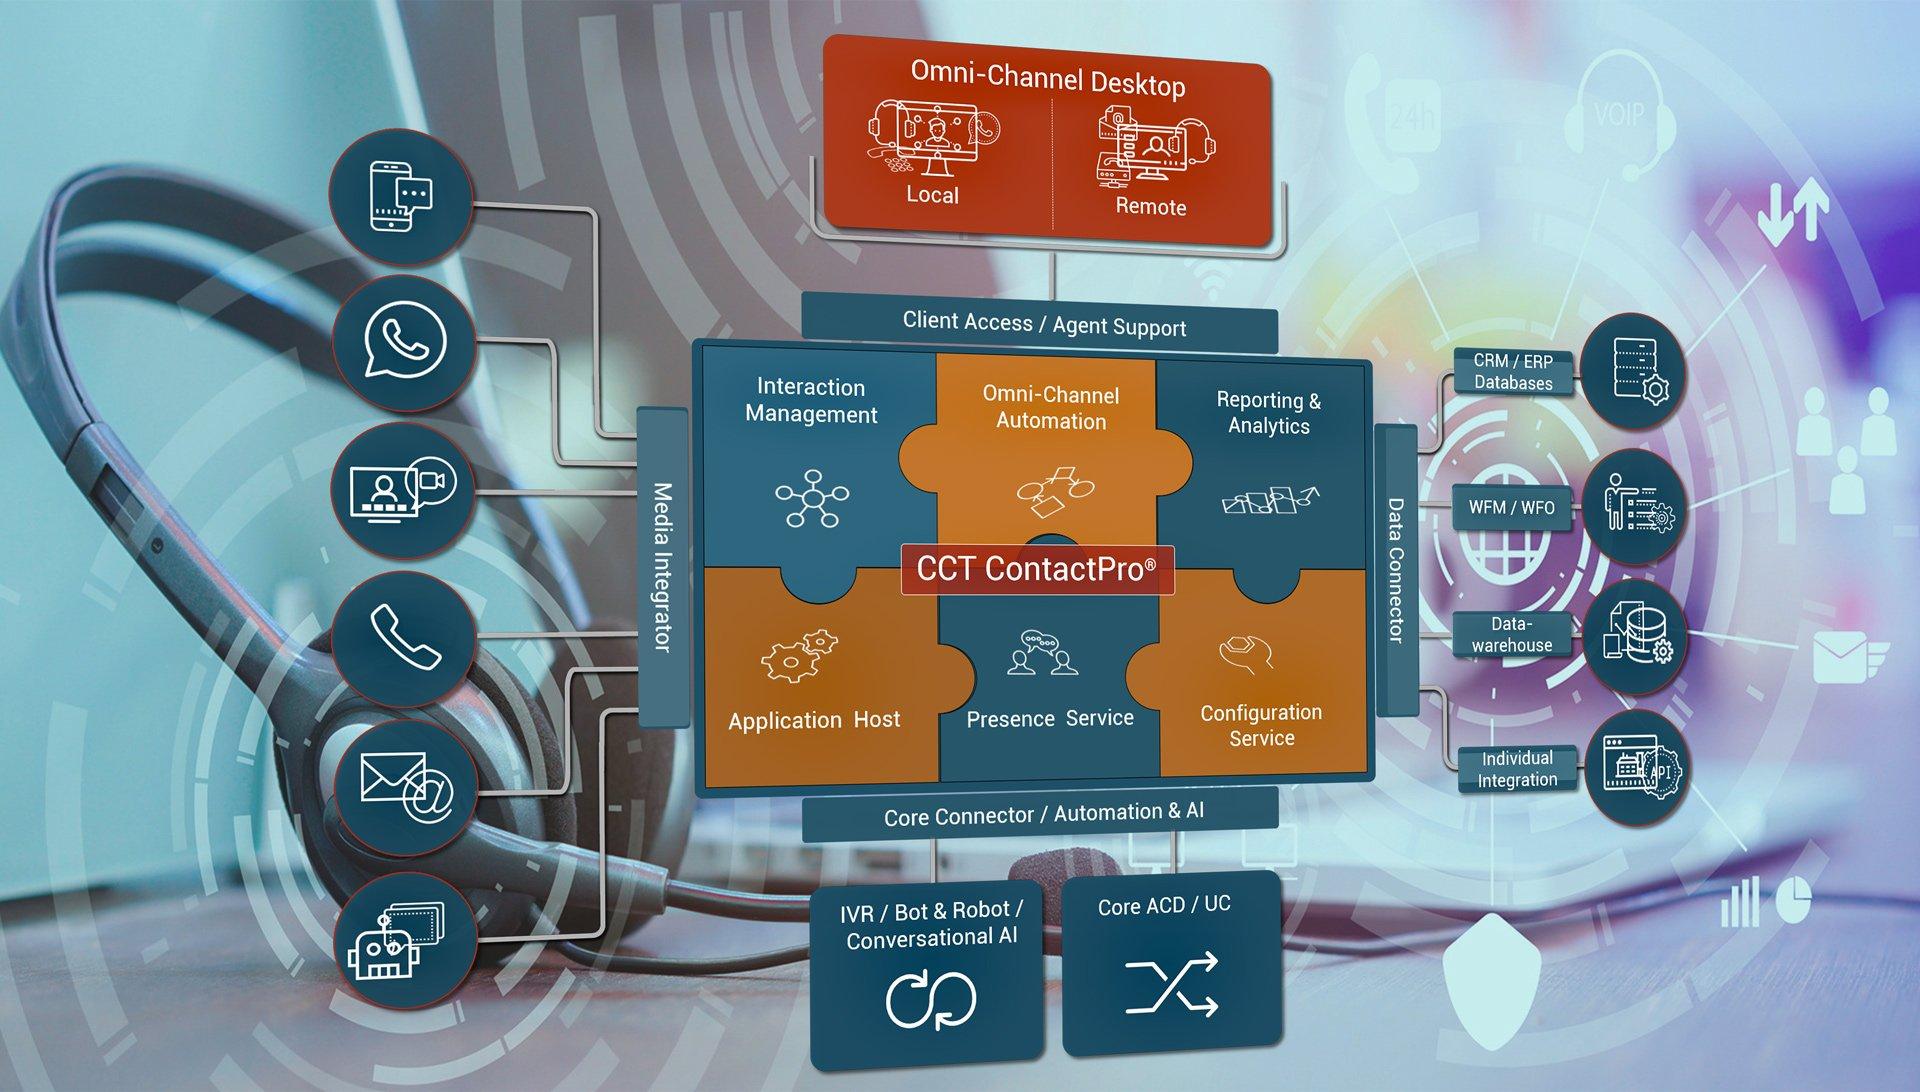 CP_Architektur-mit-Headset-v2-1